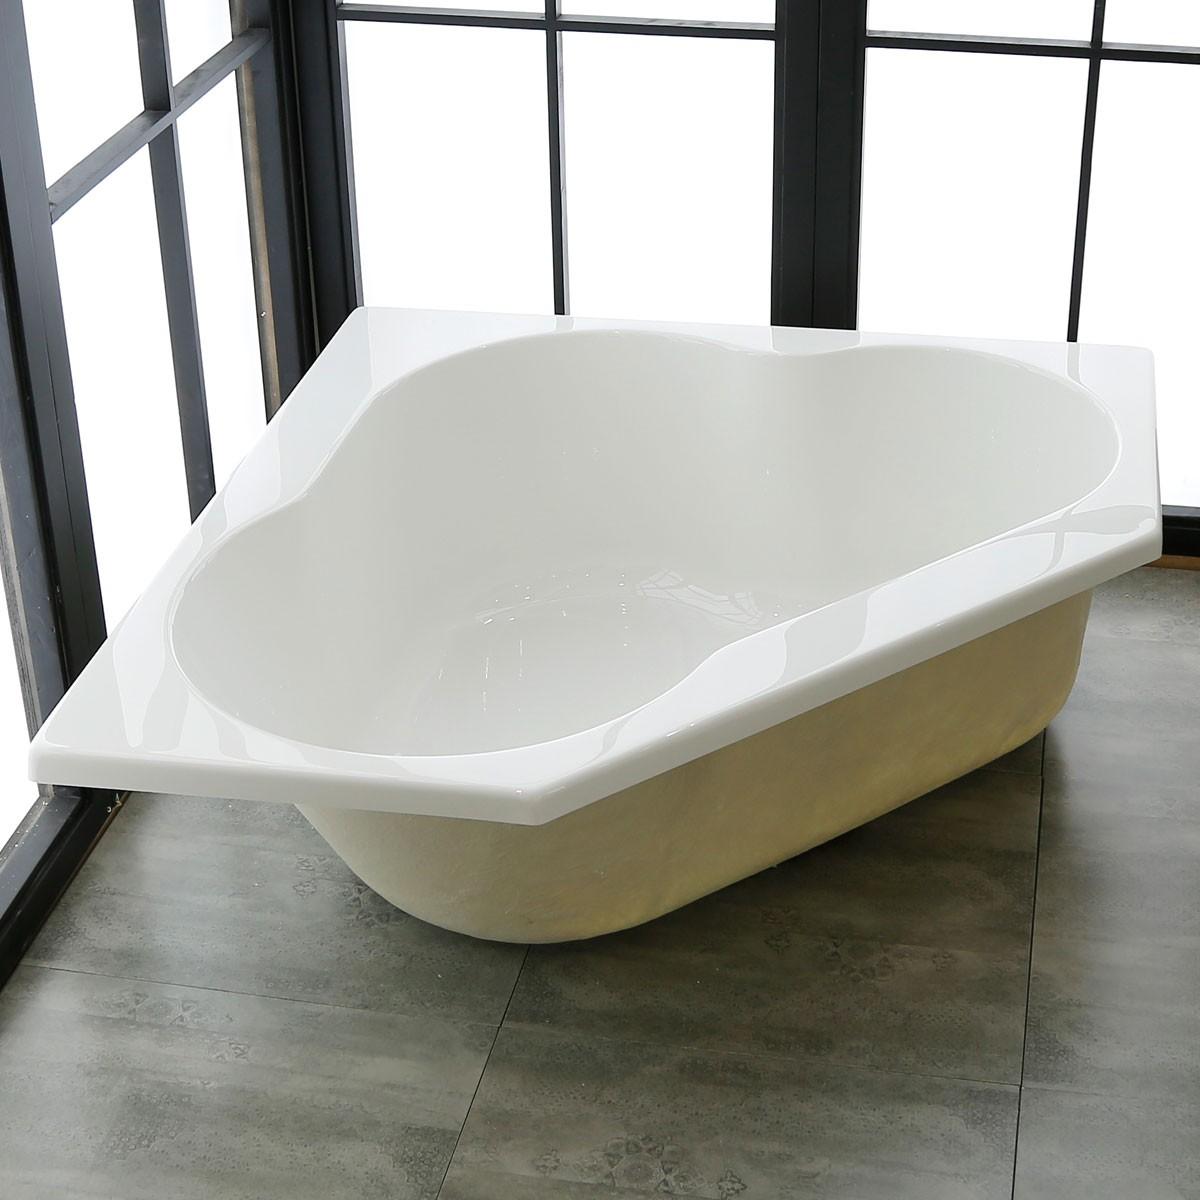 47 In Triangle Drop-in Bathtub - Acrylic Pure White (DK-PW-REALMCB ...